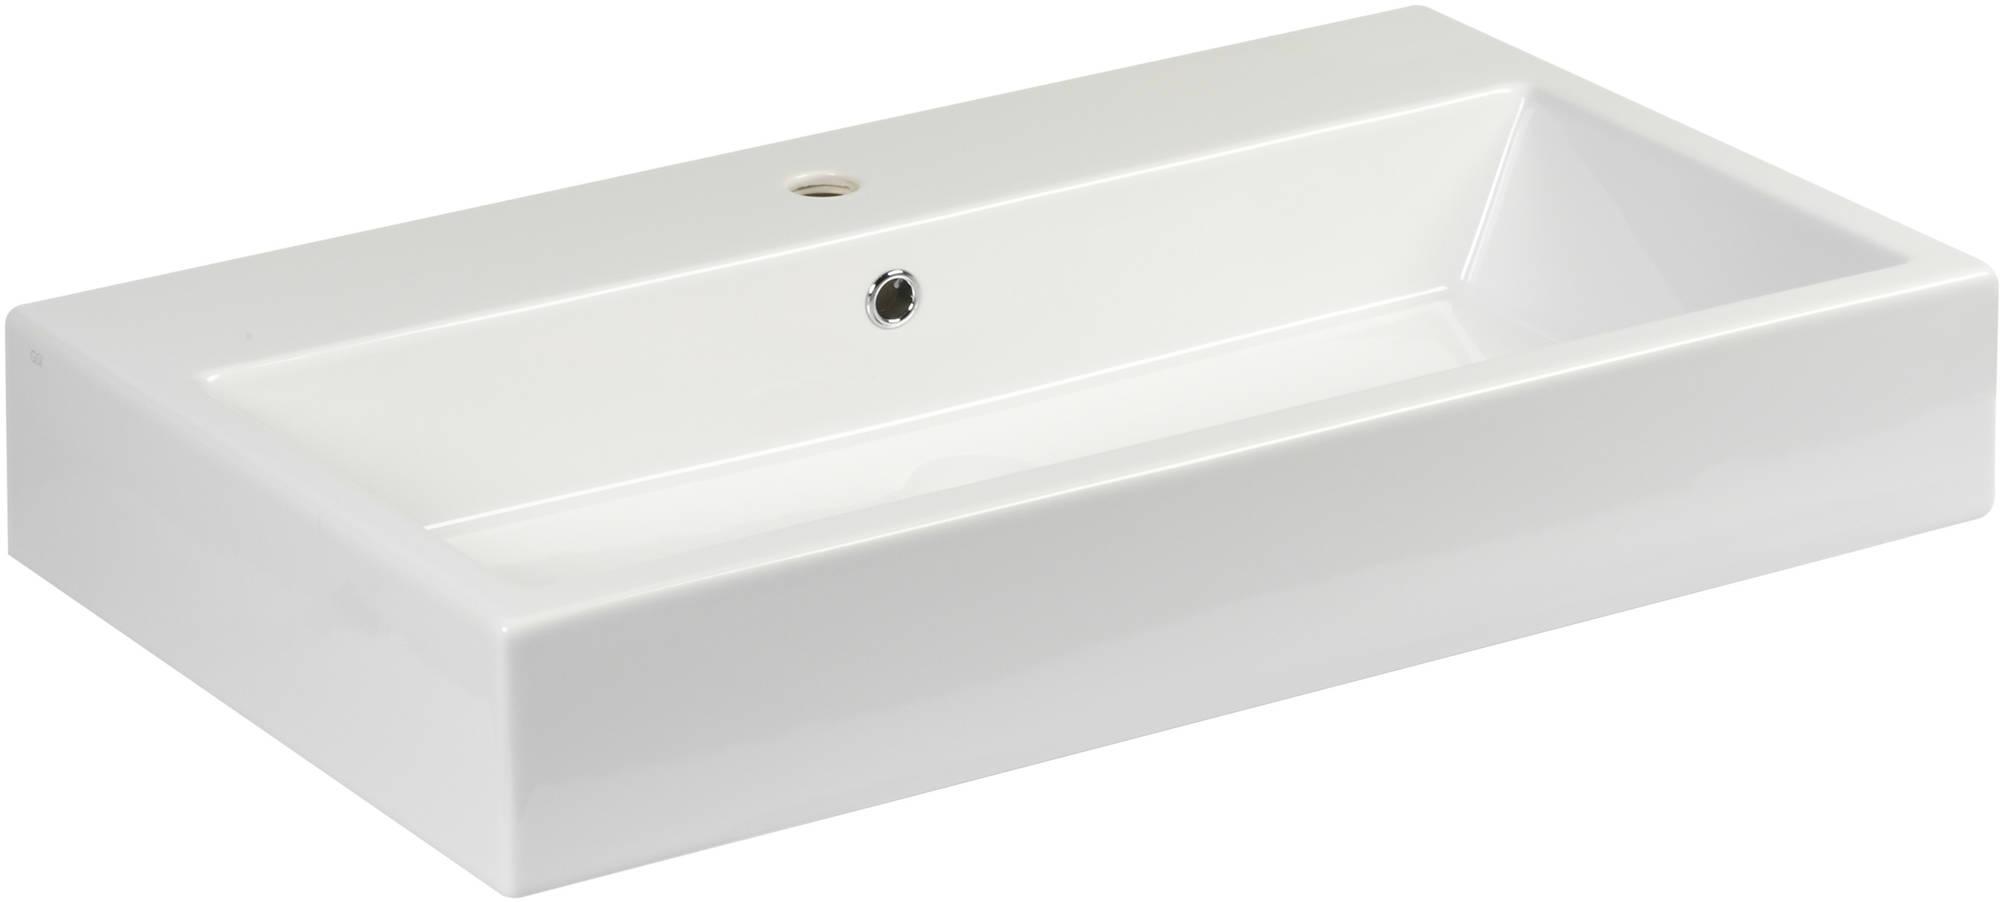 Ben Scuro Wastafel Scuro 80 cm